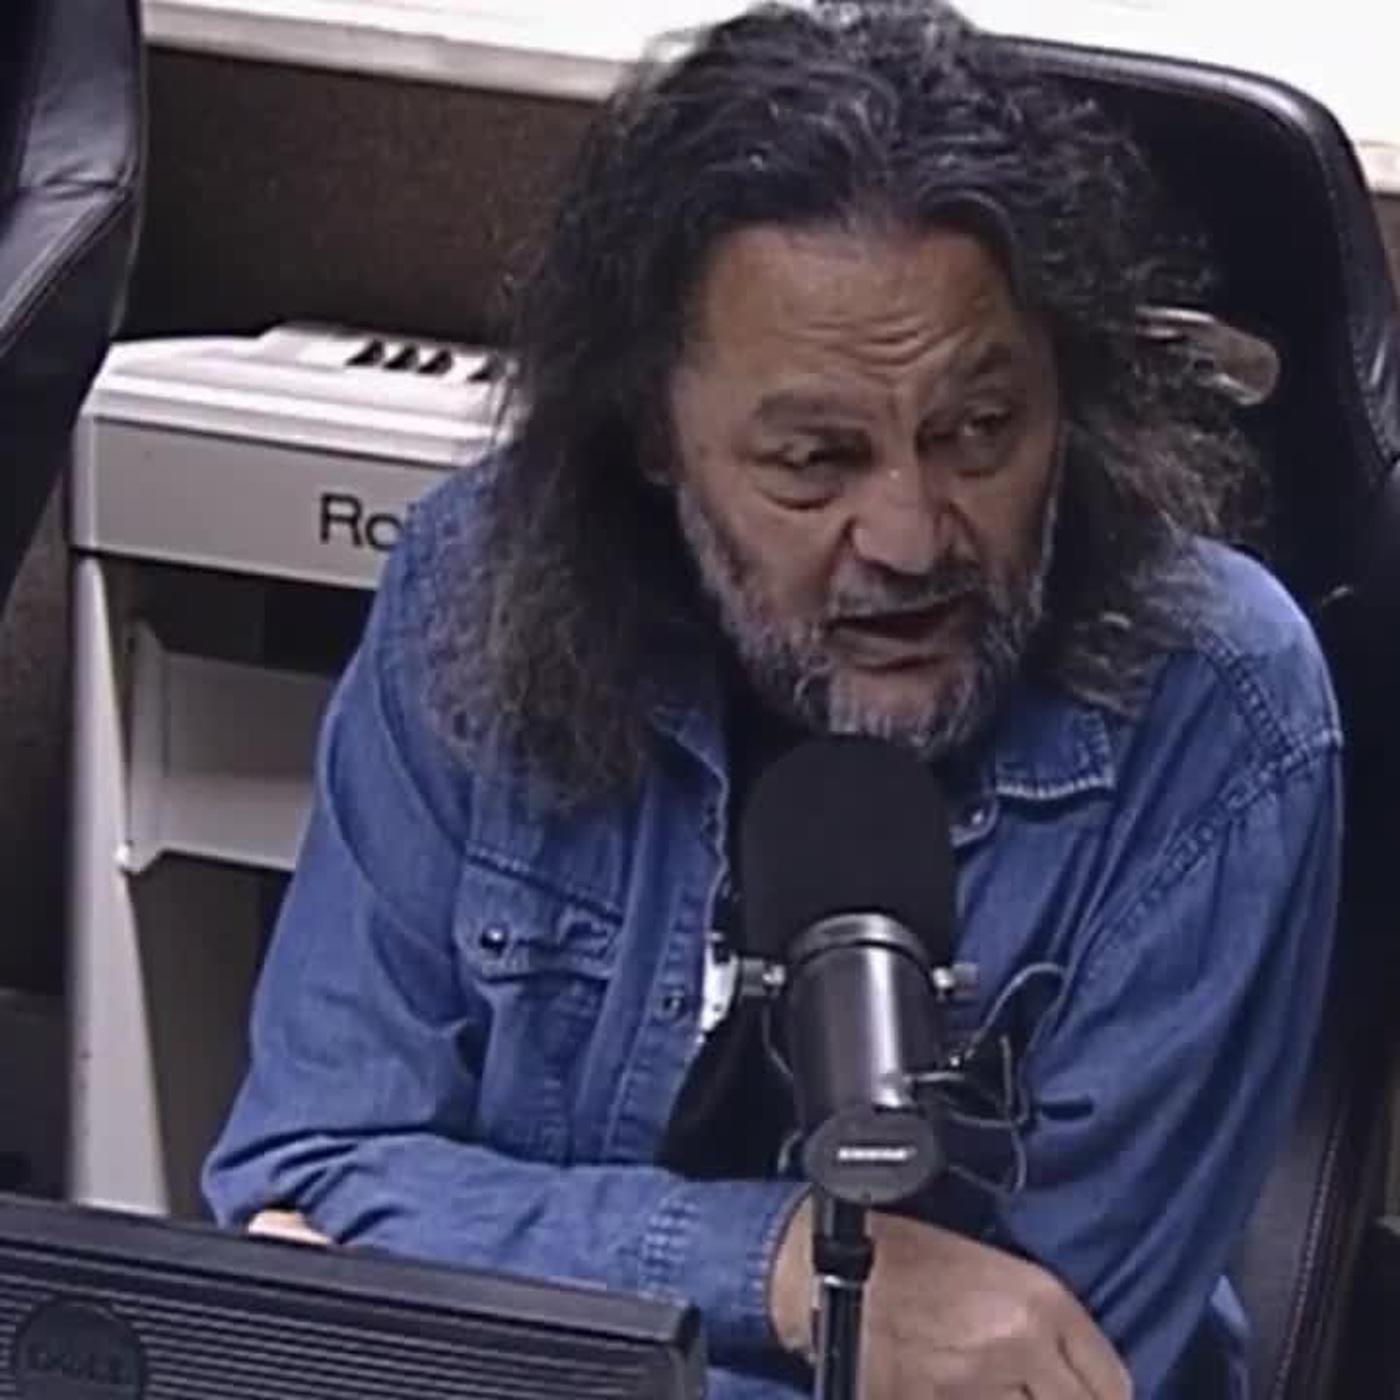 О королях музыки. Короли рока